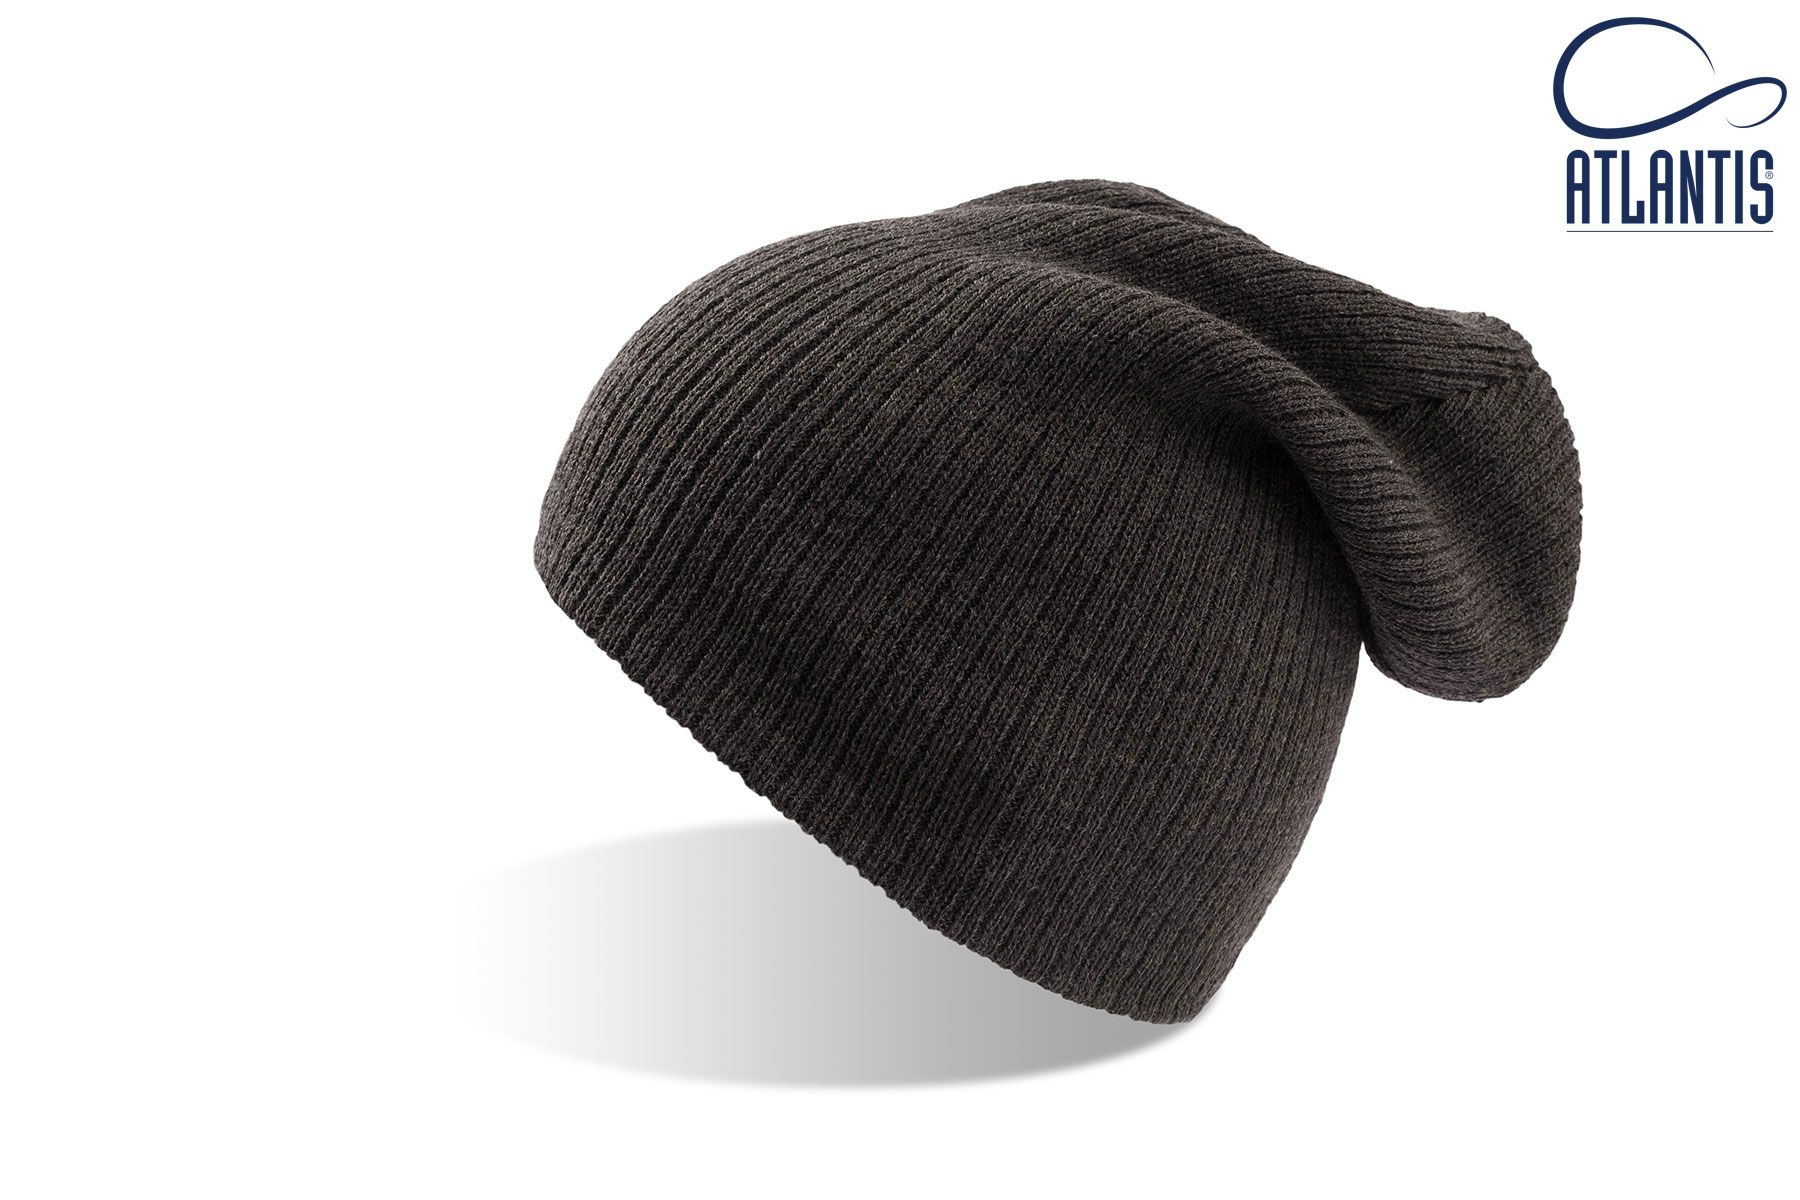 2b6714ad760 BRAD cap - long and confortable beanie - 85% acrylic yarn 15% polyester -